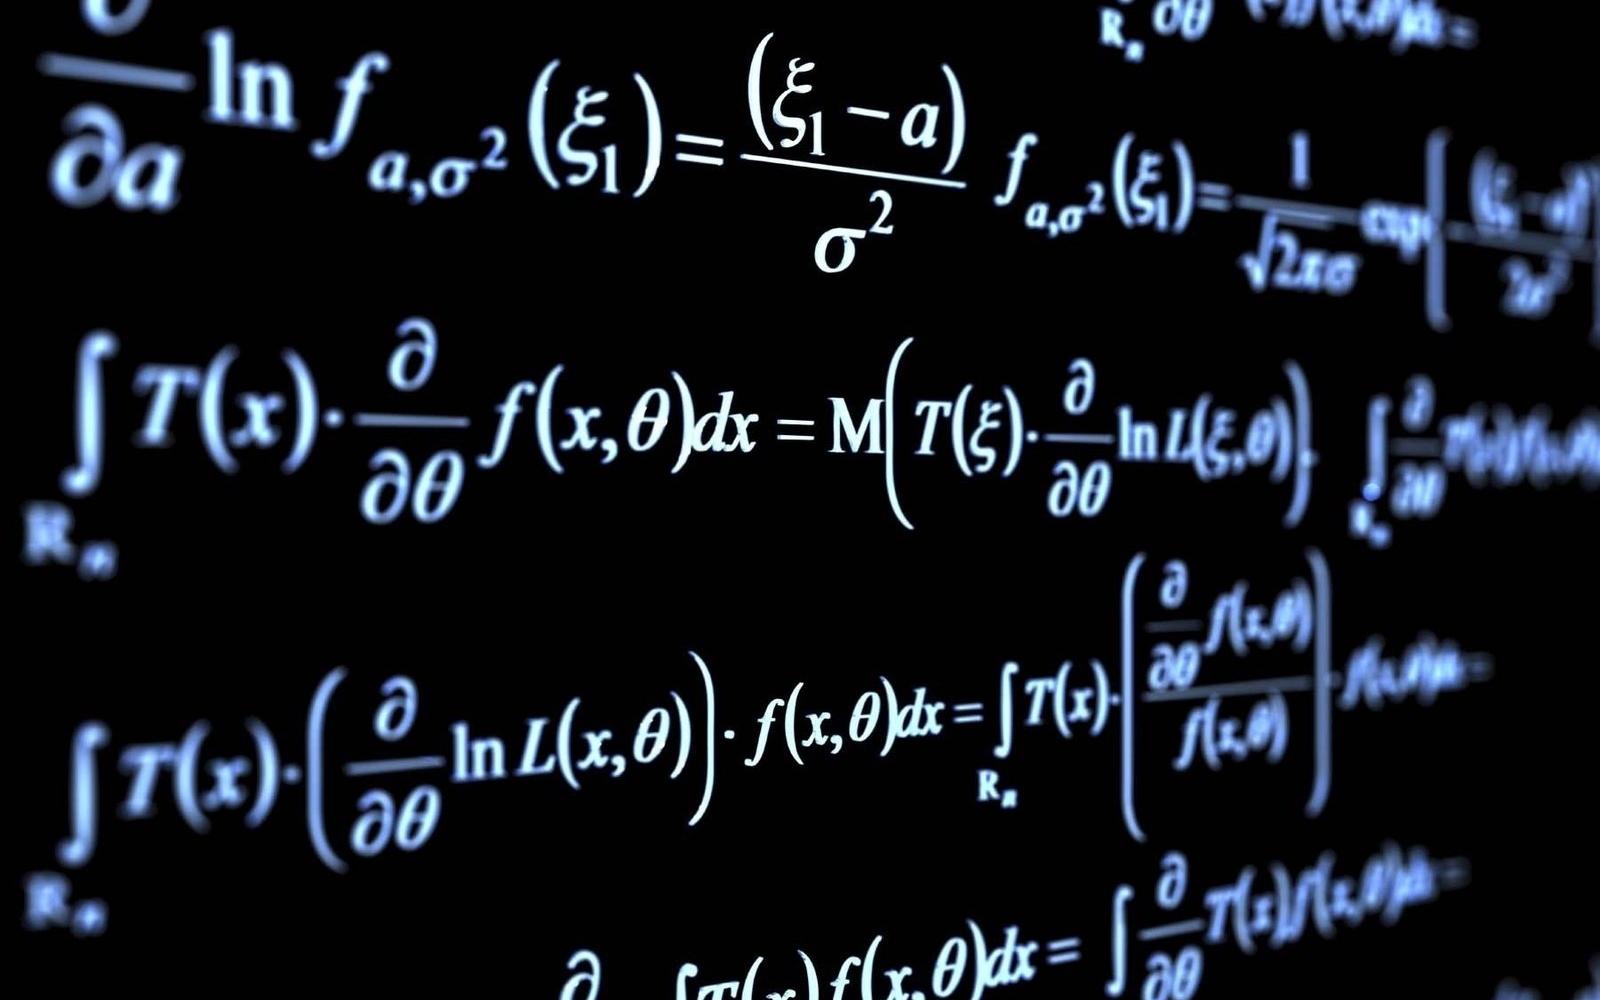 matematica_per_professioni_sanitarie_1535104424.png